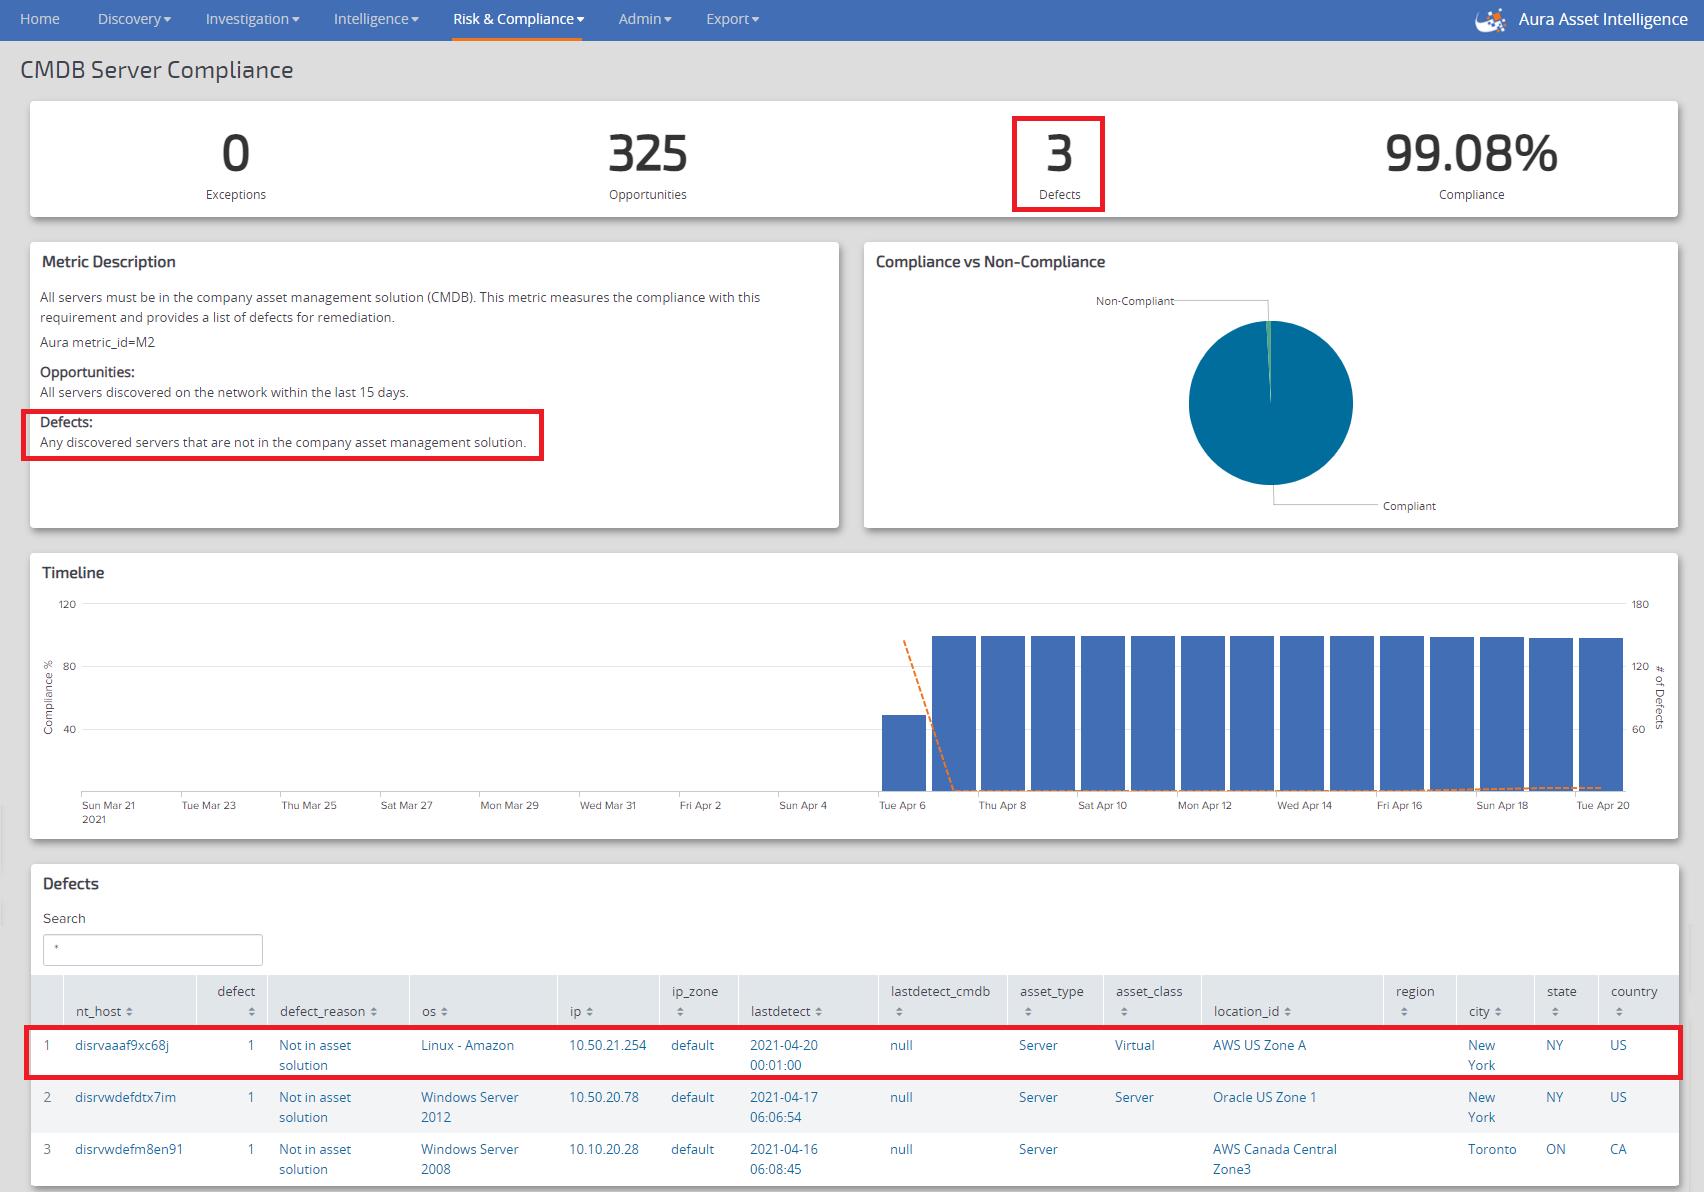 Aura CMDB Server Compliance Report